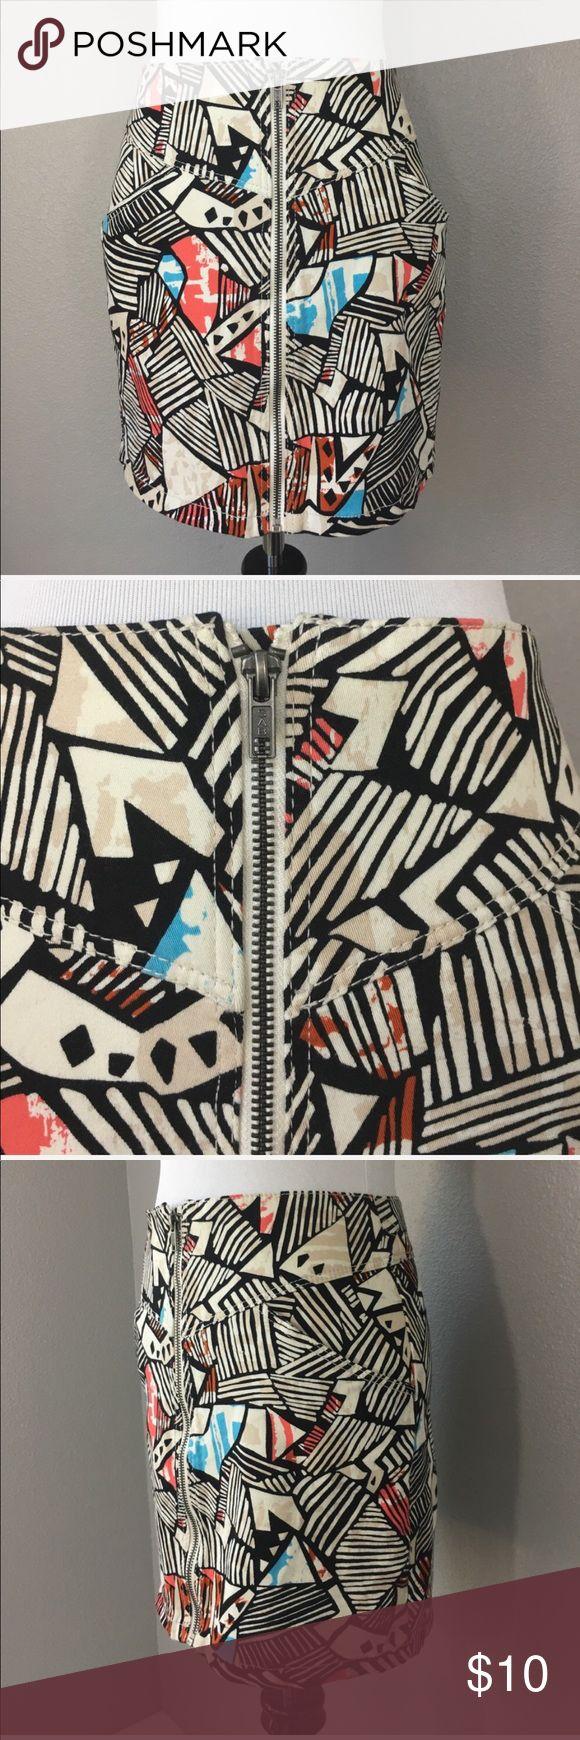 "Divider zipper front skirt size 6 Divided Skirt. 90% Cotton 3% elastane   Zippered front  Geometrical print  Size 6  Measurements laying flat  Waist: 13.5""  Length: 15"" Divided Skirts Midi"